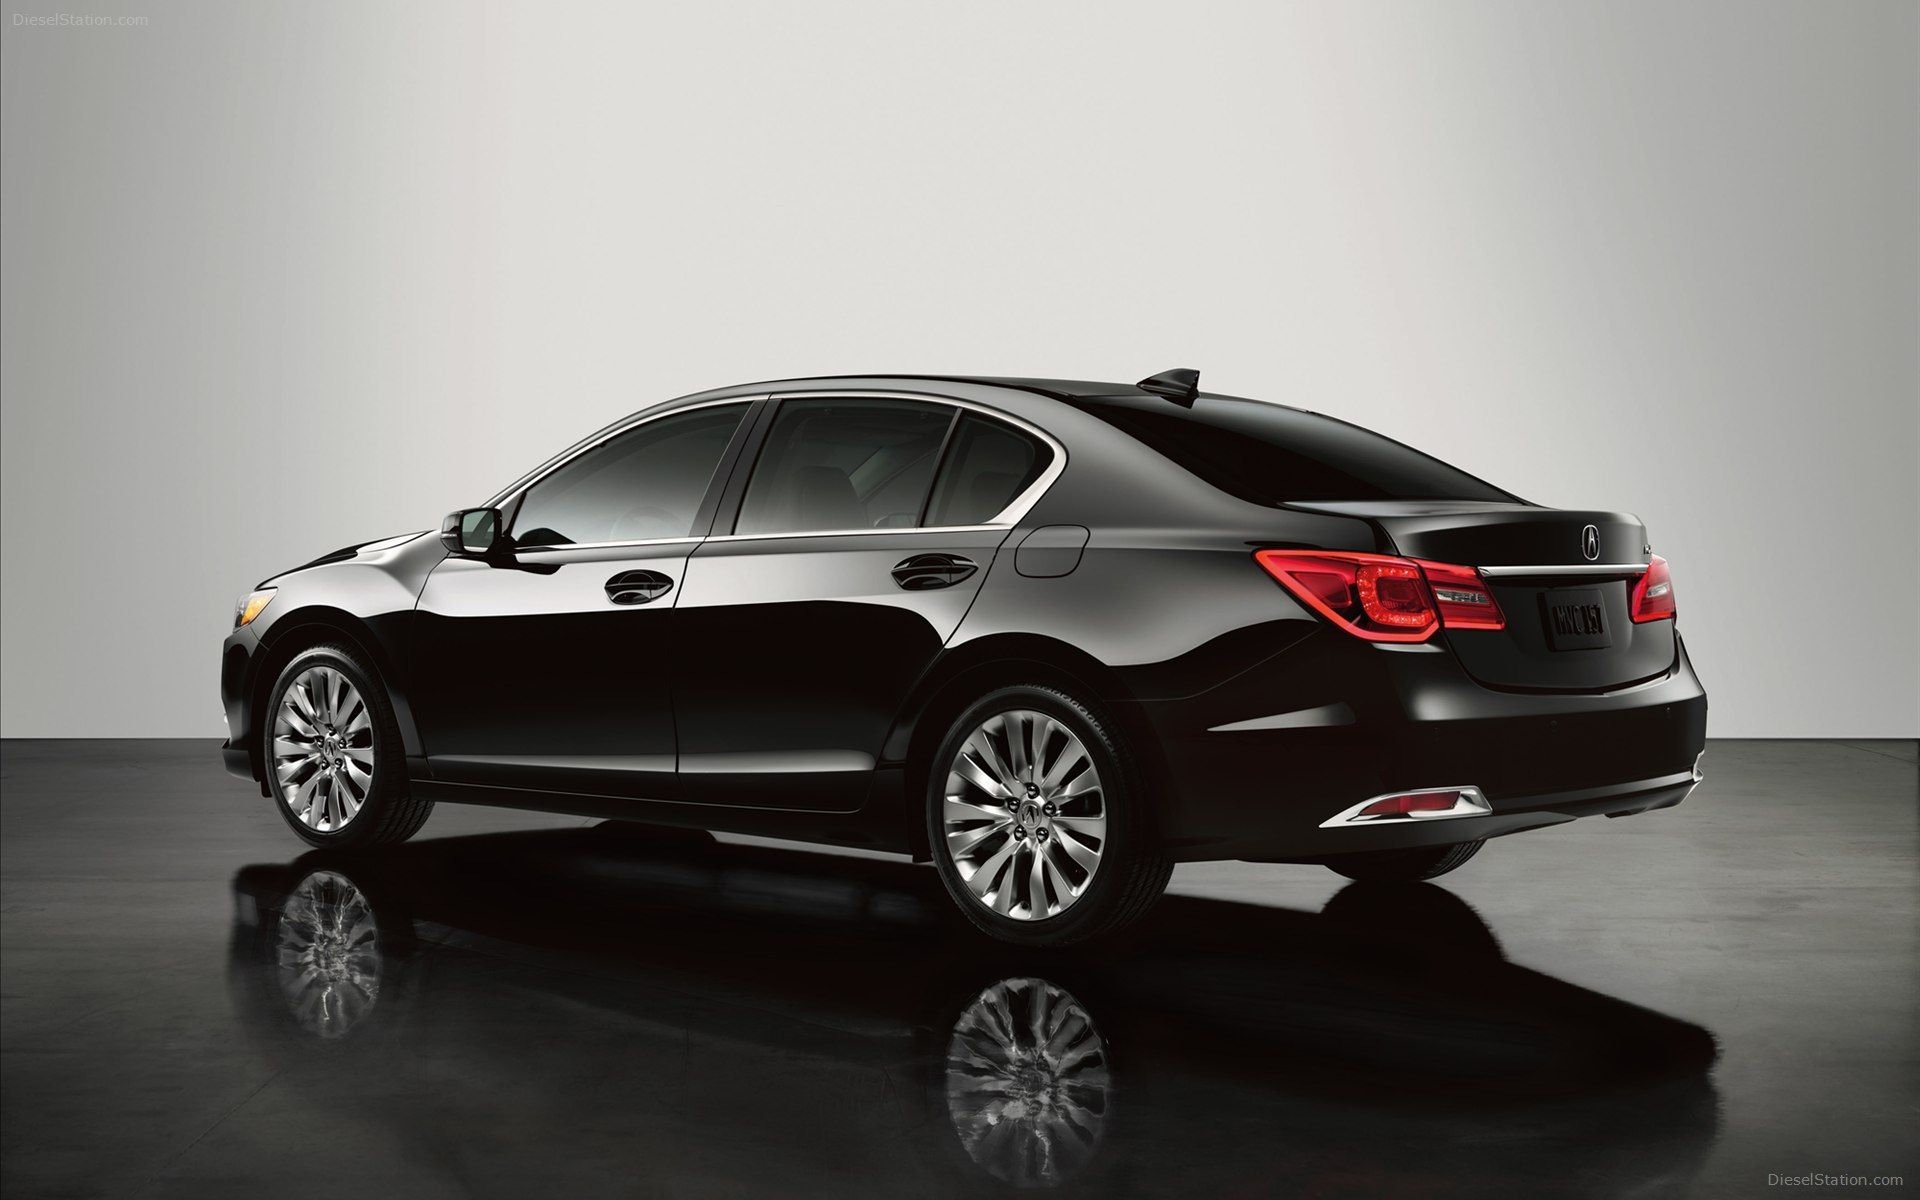 2014 Acura Rlx Black Rear Wallpaper Black Honda Honda City Acura Tl